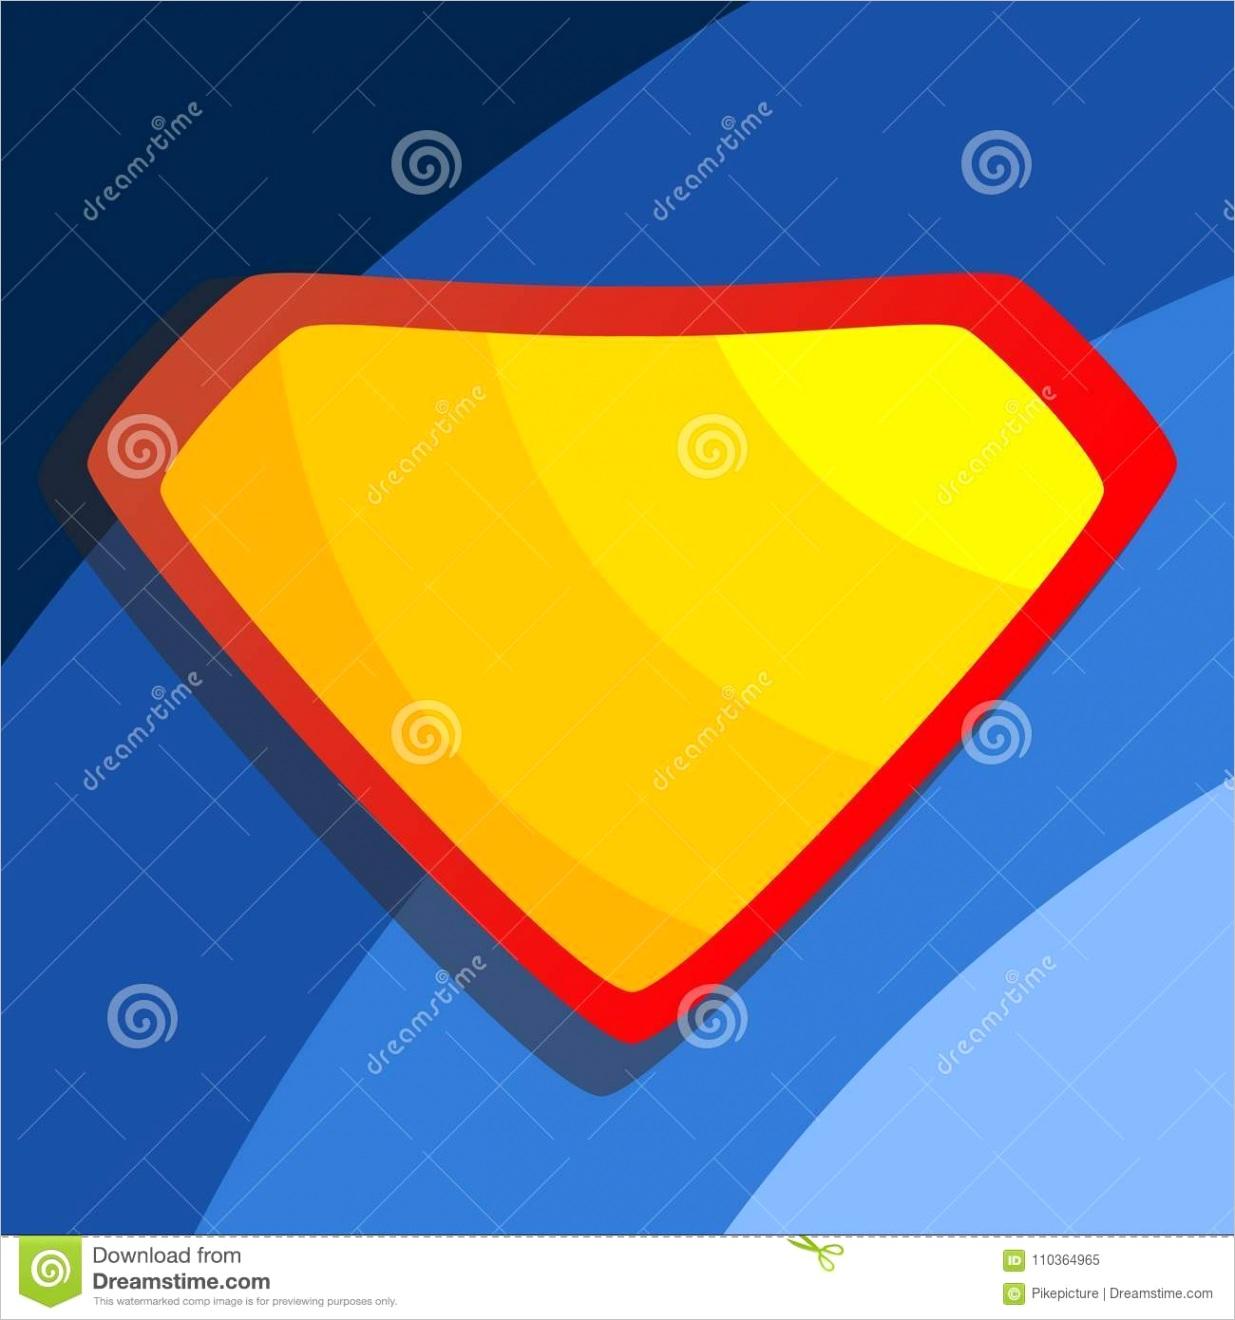 superhero logo vector yellow red shield emblem template flat cartoon ic illustration diamond symbol shape badge super powers image